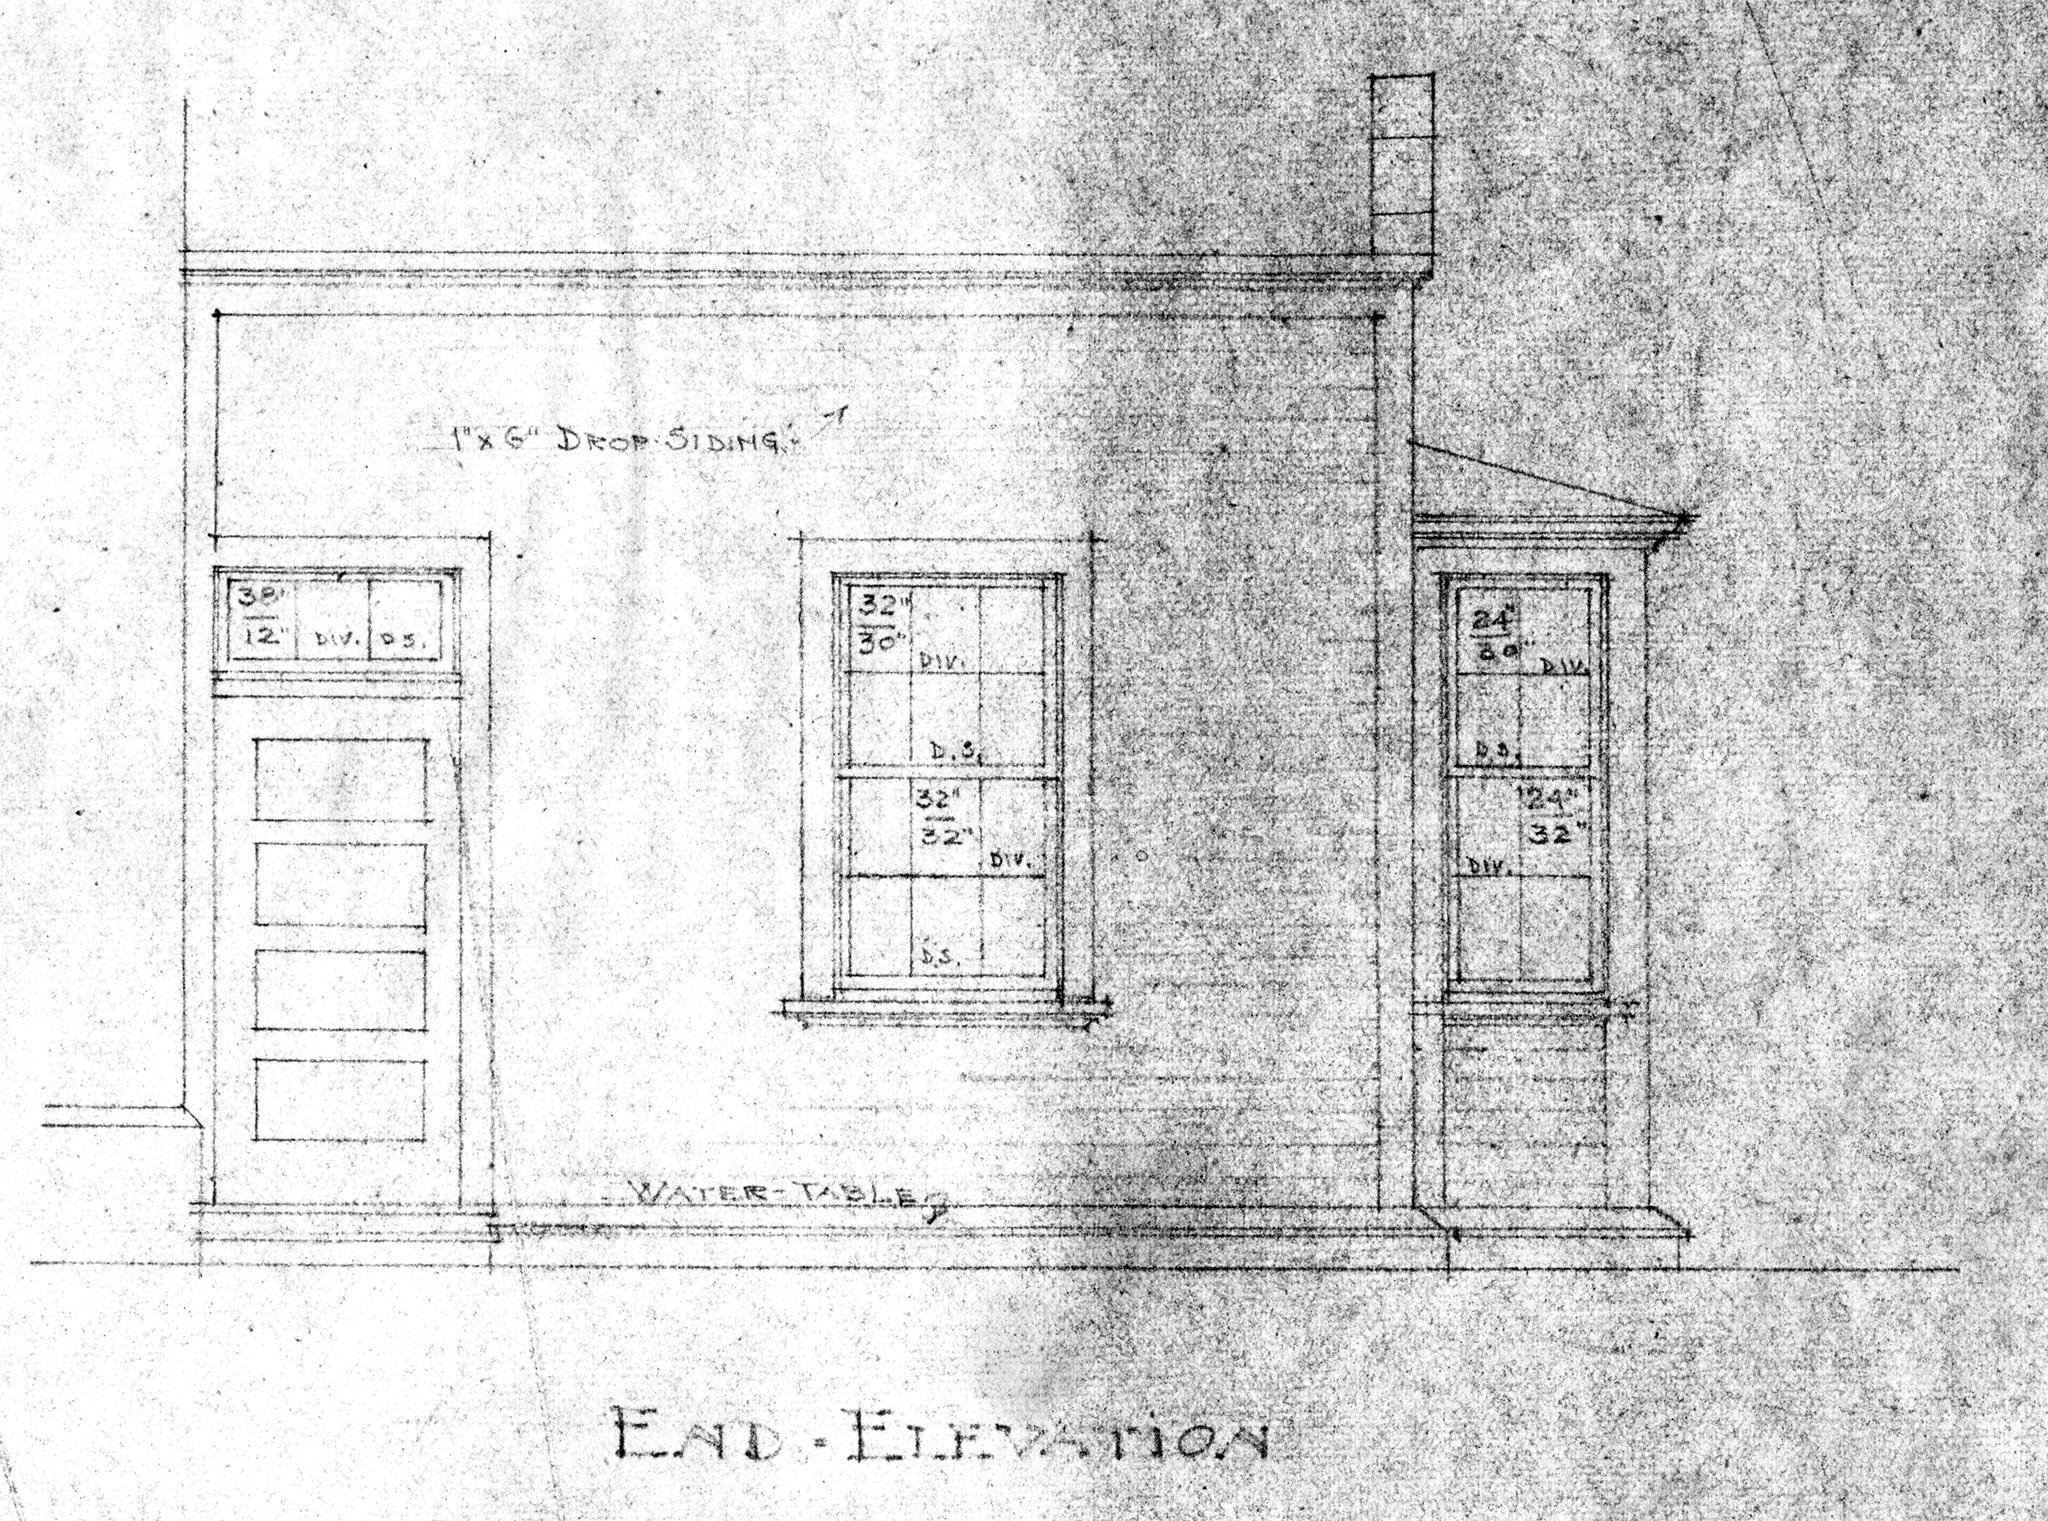 Multnomah Station Blueprint, End Elevation, ca. 1908. Courtesy Le Meitour Gallery.